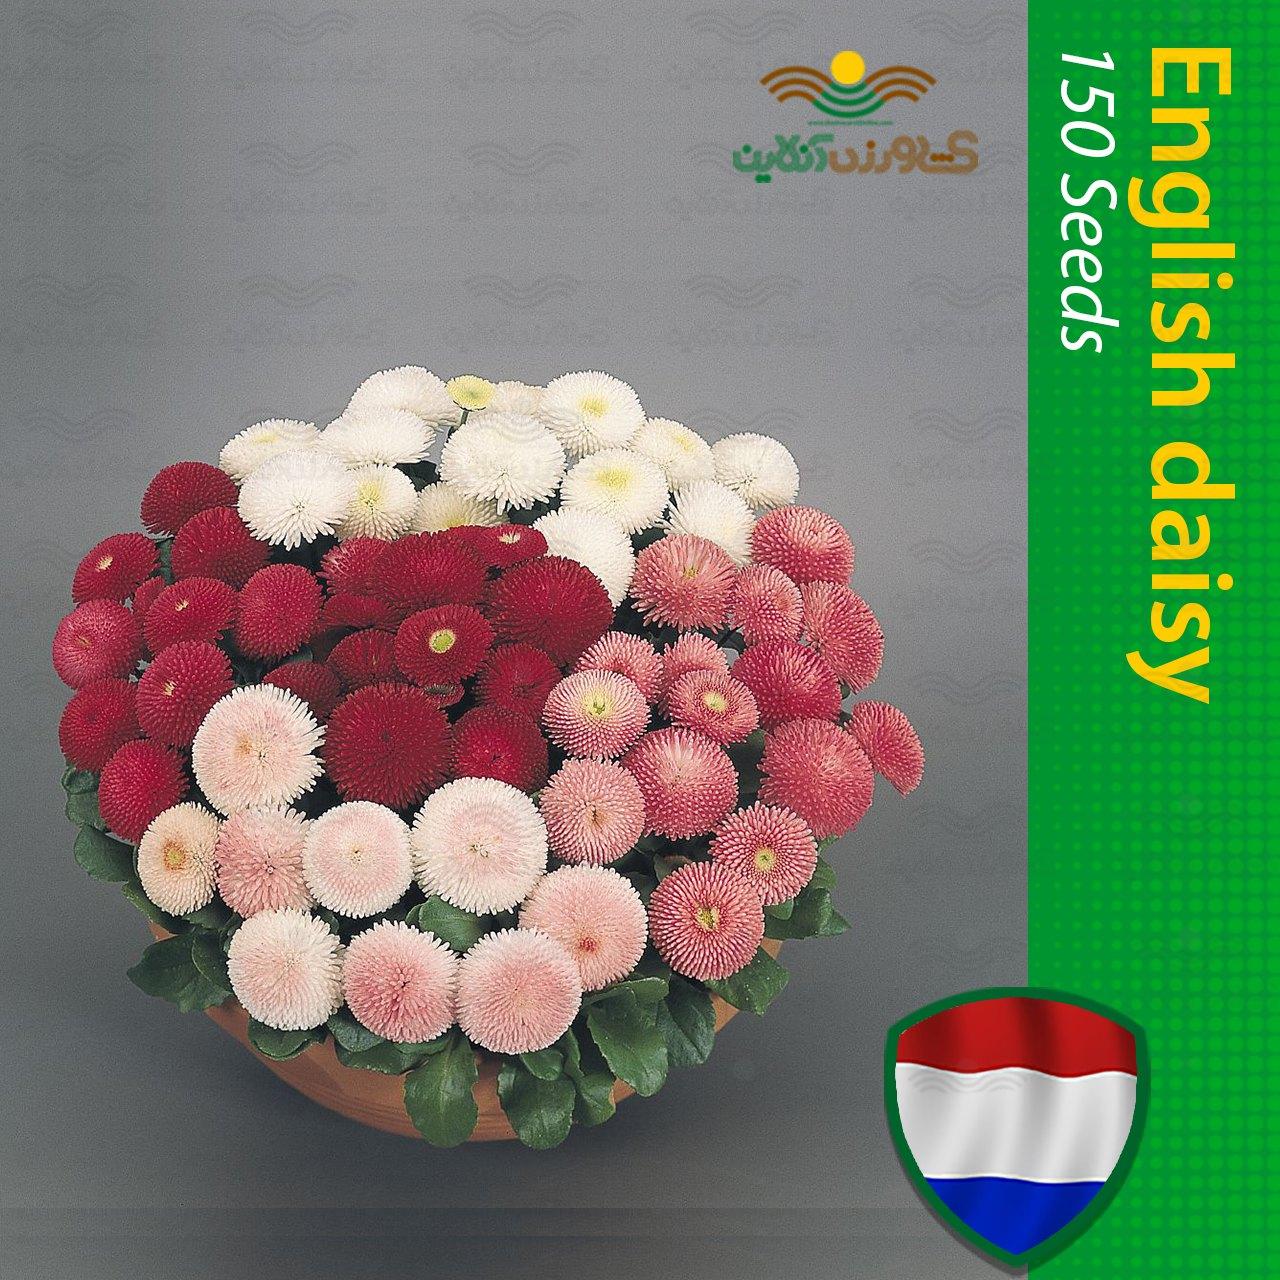 بذر گل مینا چمنی هلندی الوان